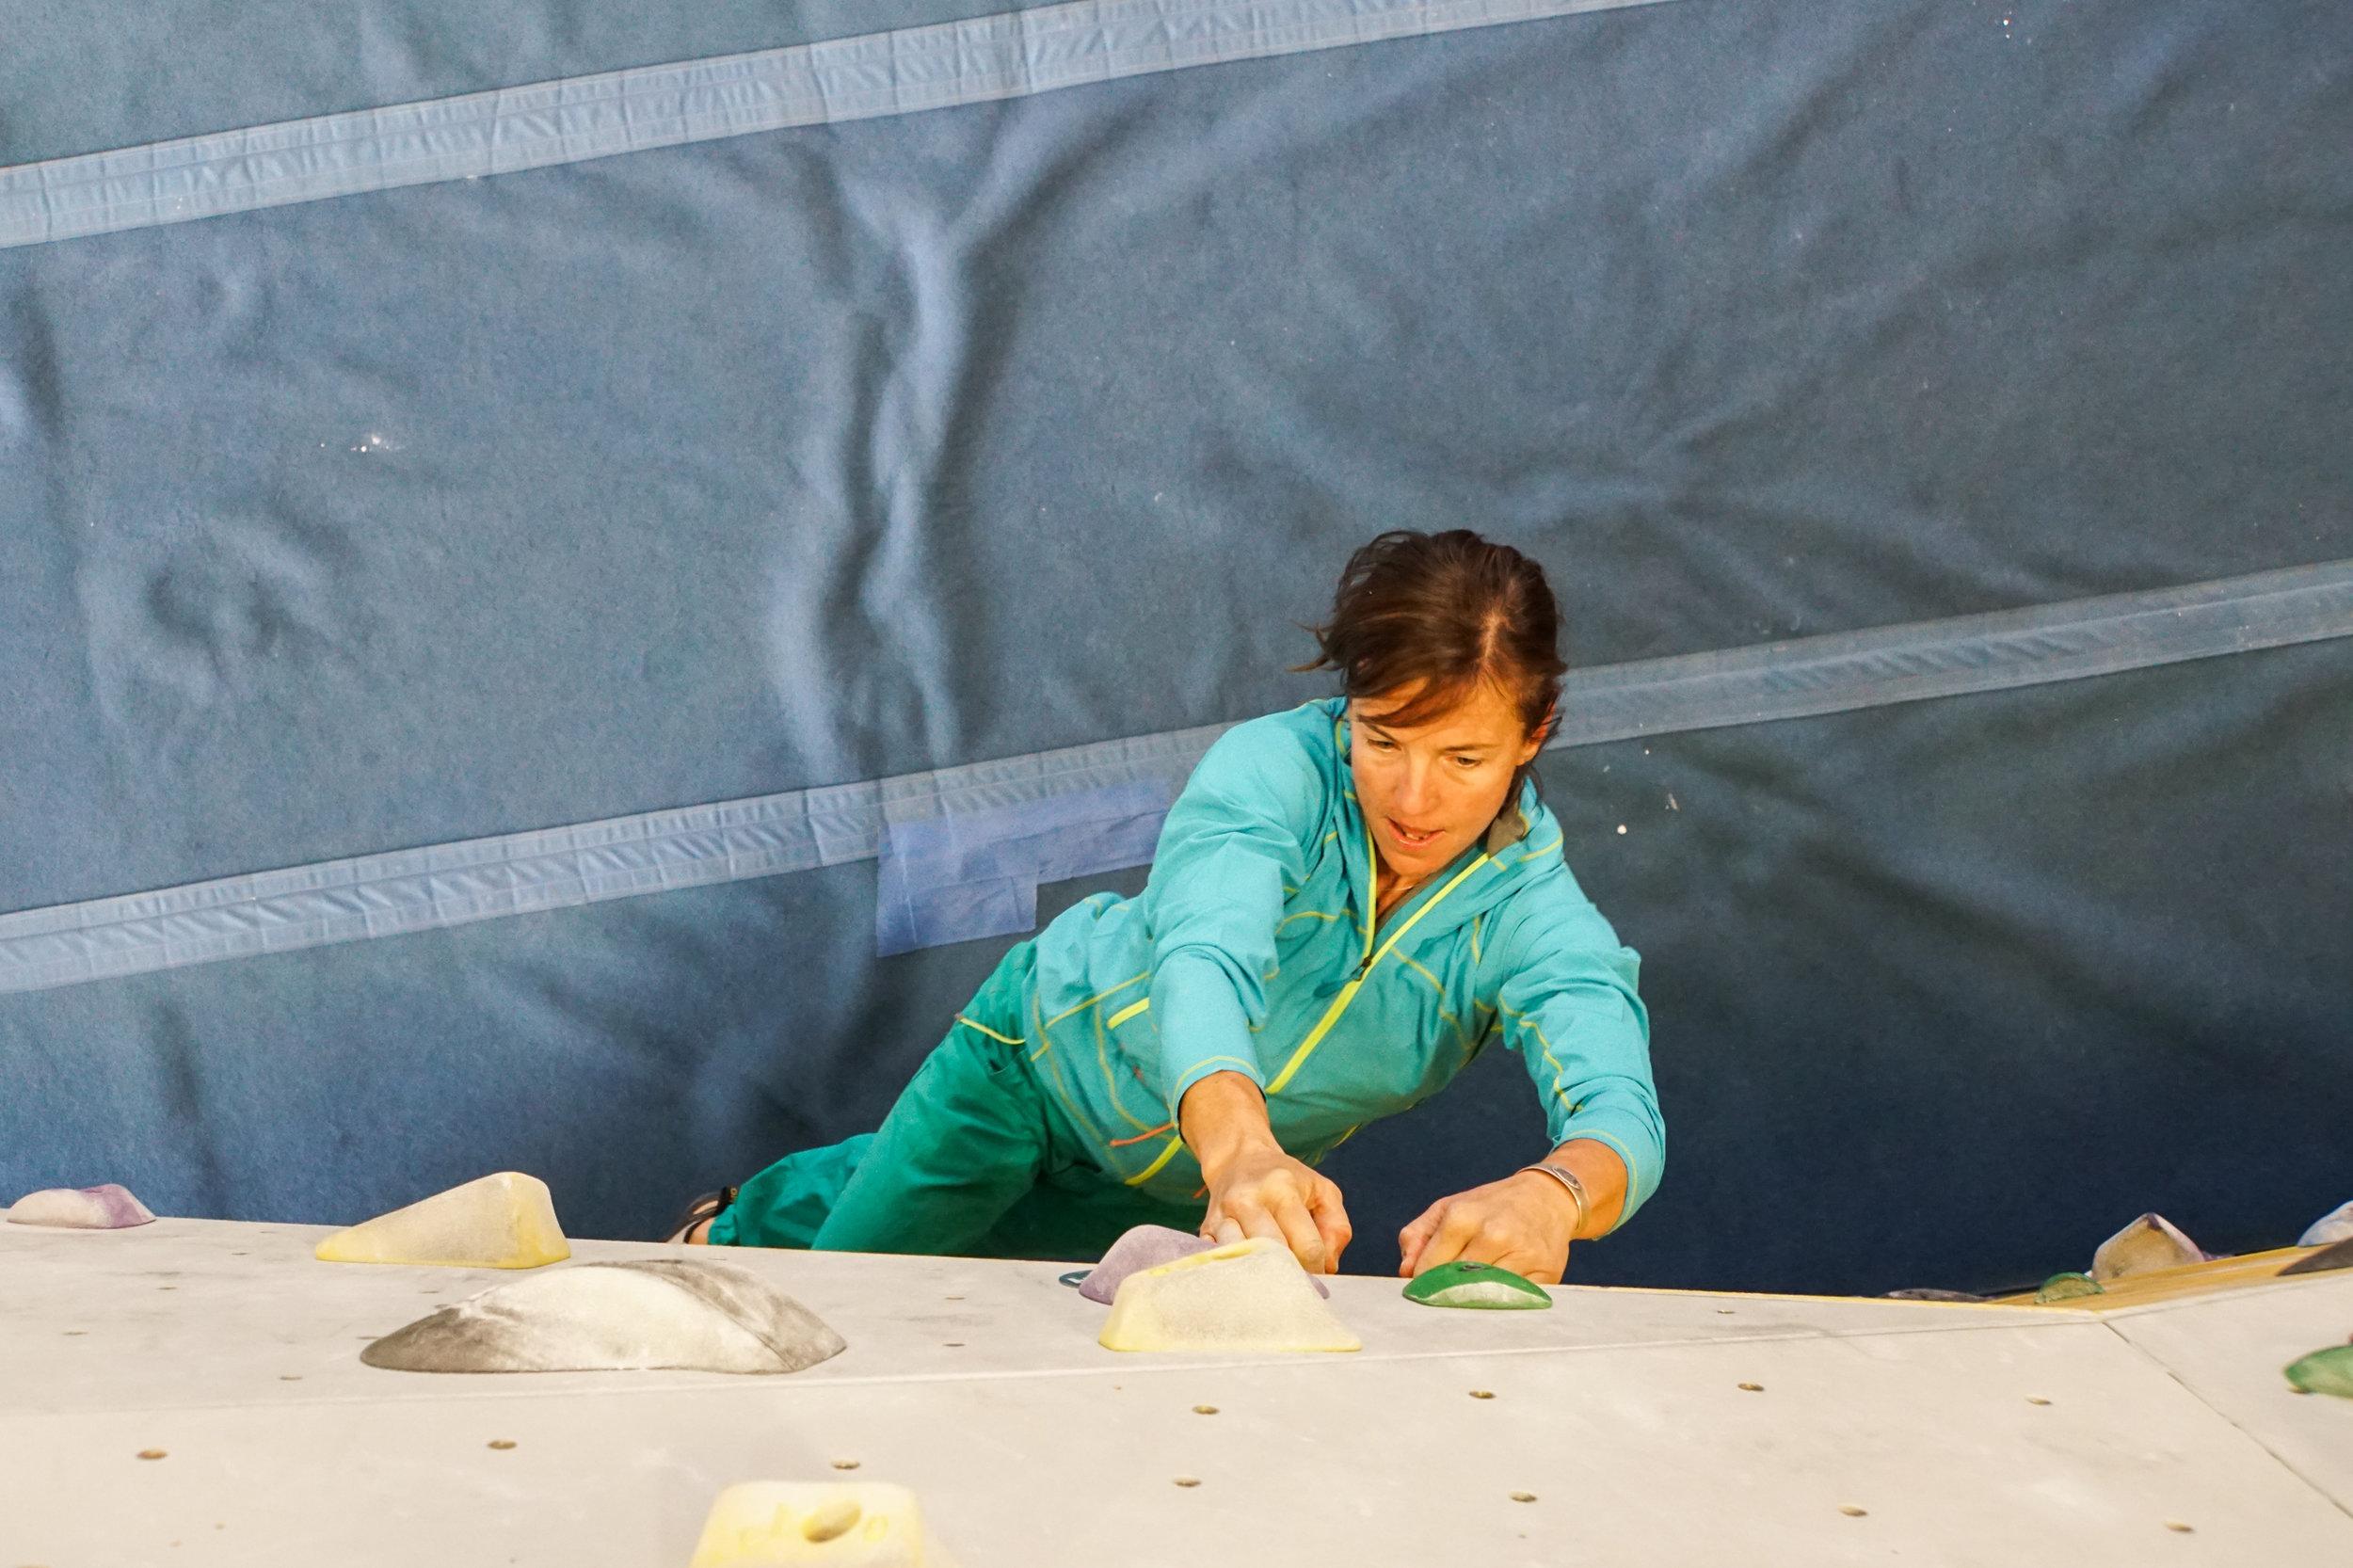 Climbing indoors training women strong